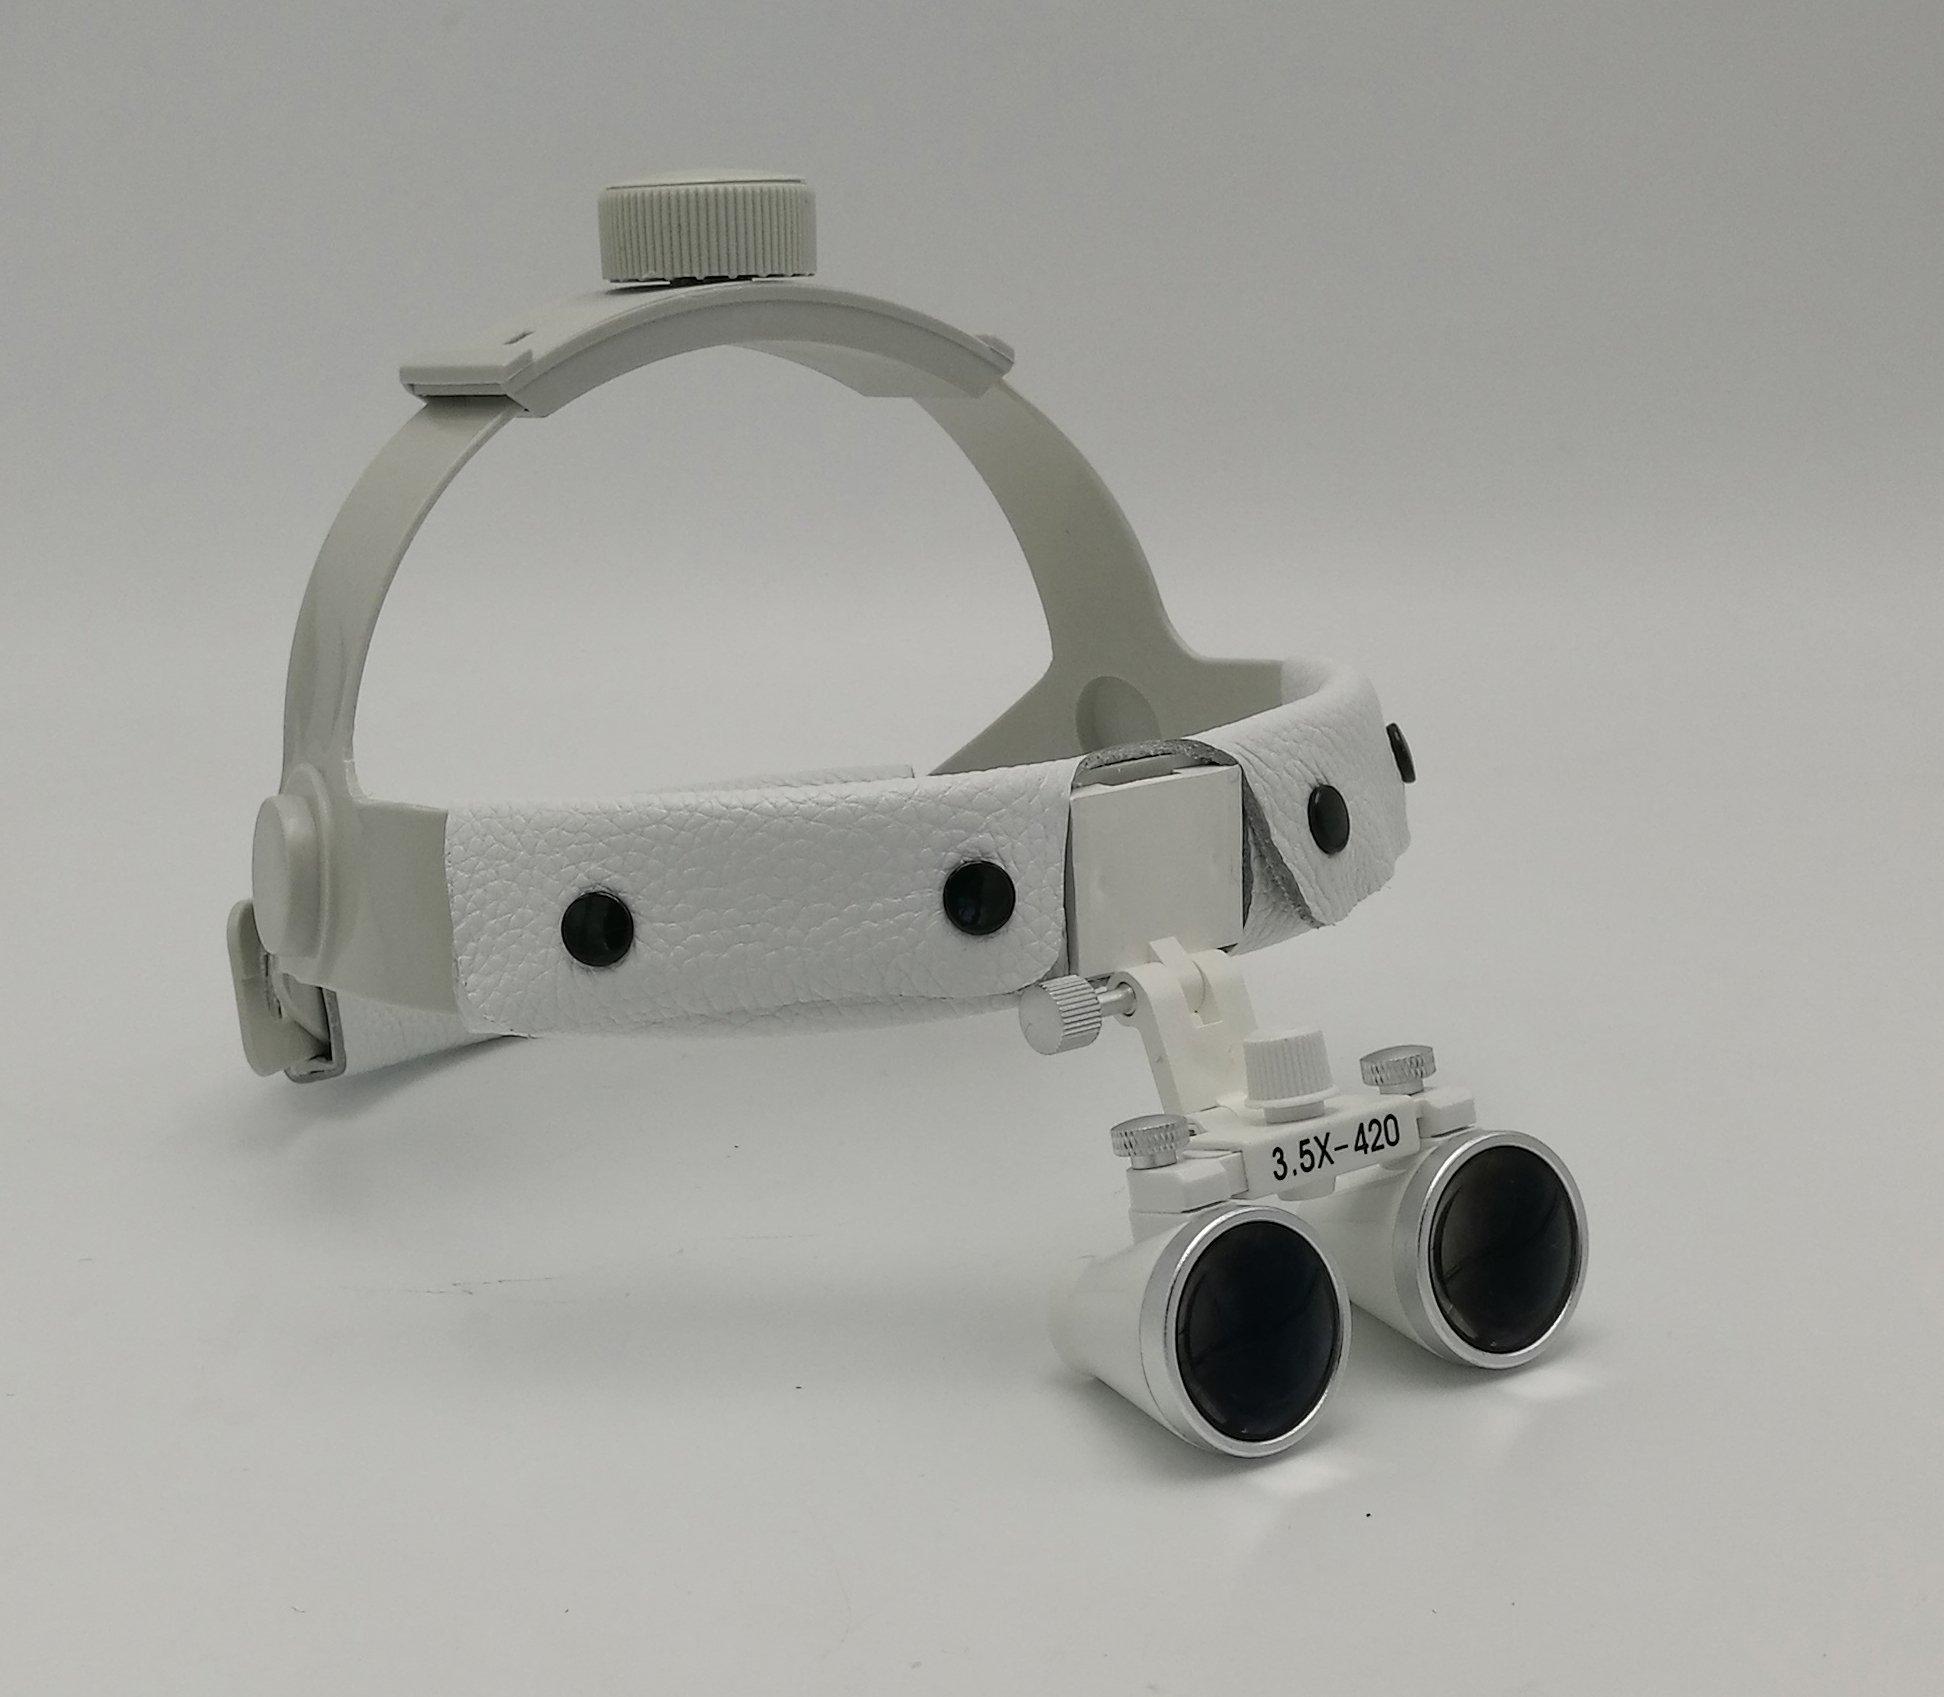 NSKI Headband Surgical Medical Binocular Loupes 3.5X420mm Dental Lab Equipment DY-108 White